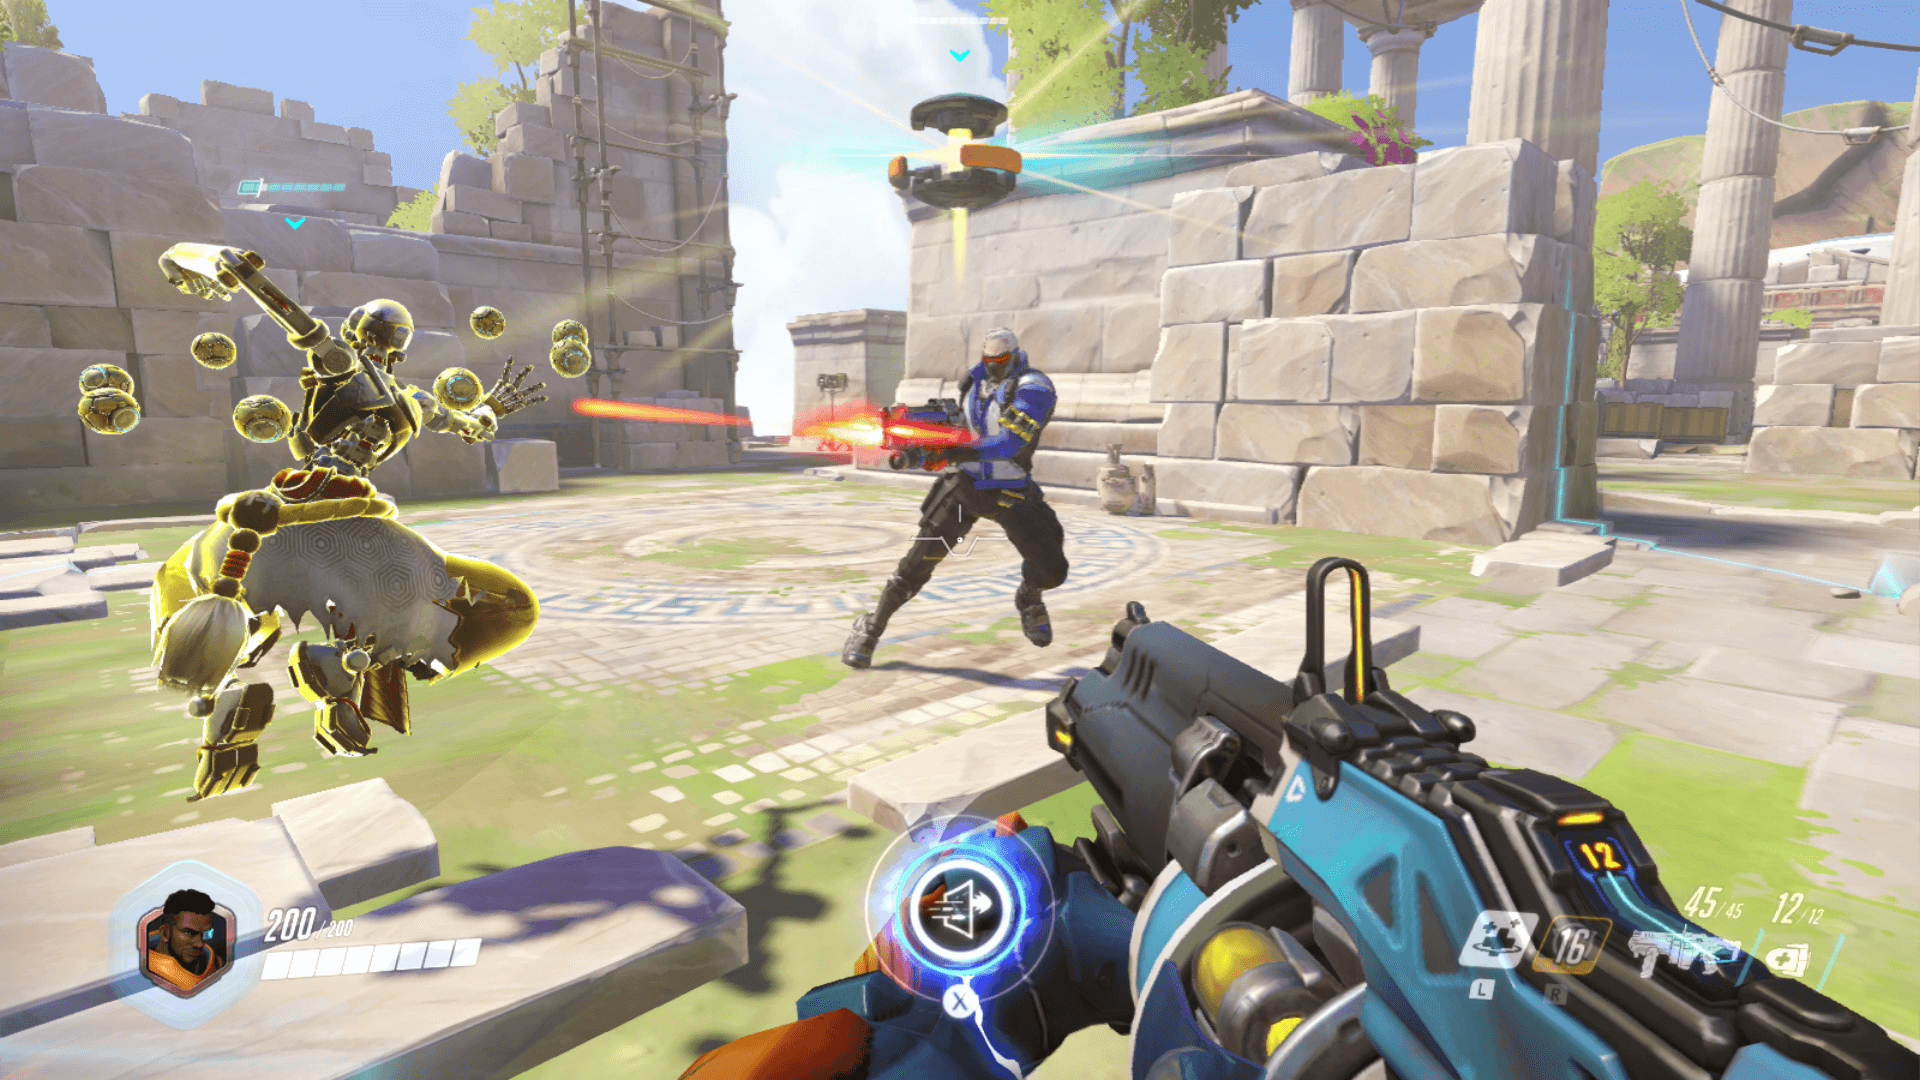 Overwatch Nintendo Switch screenshot